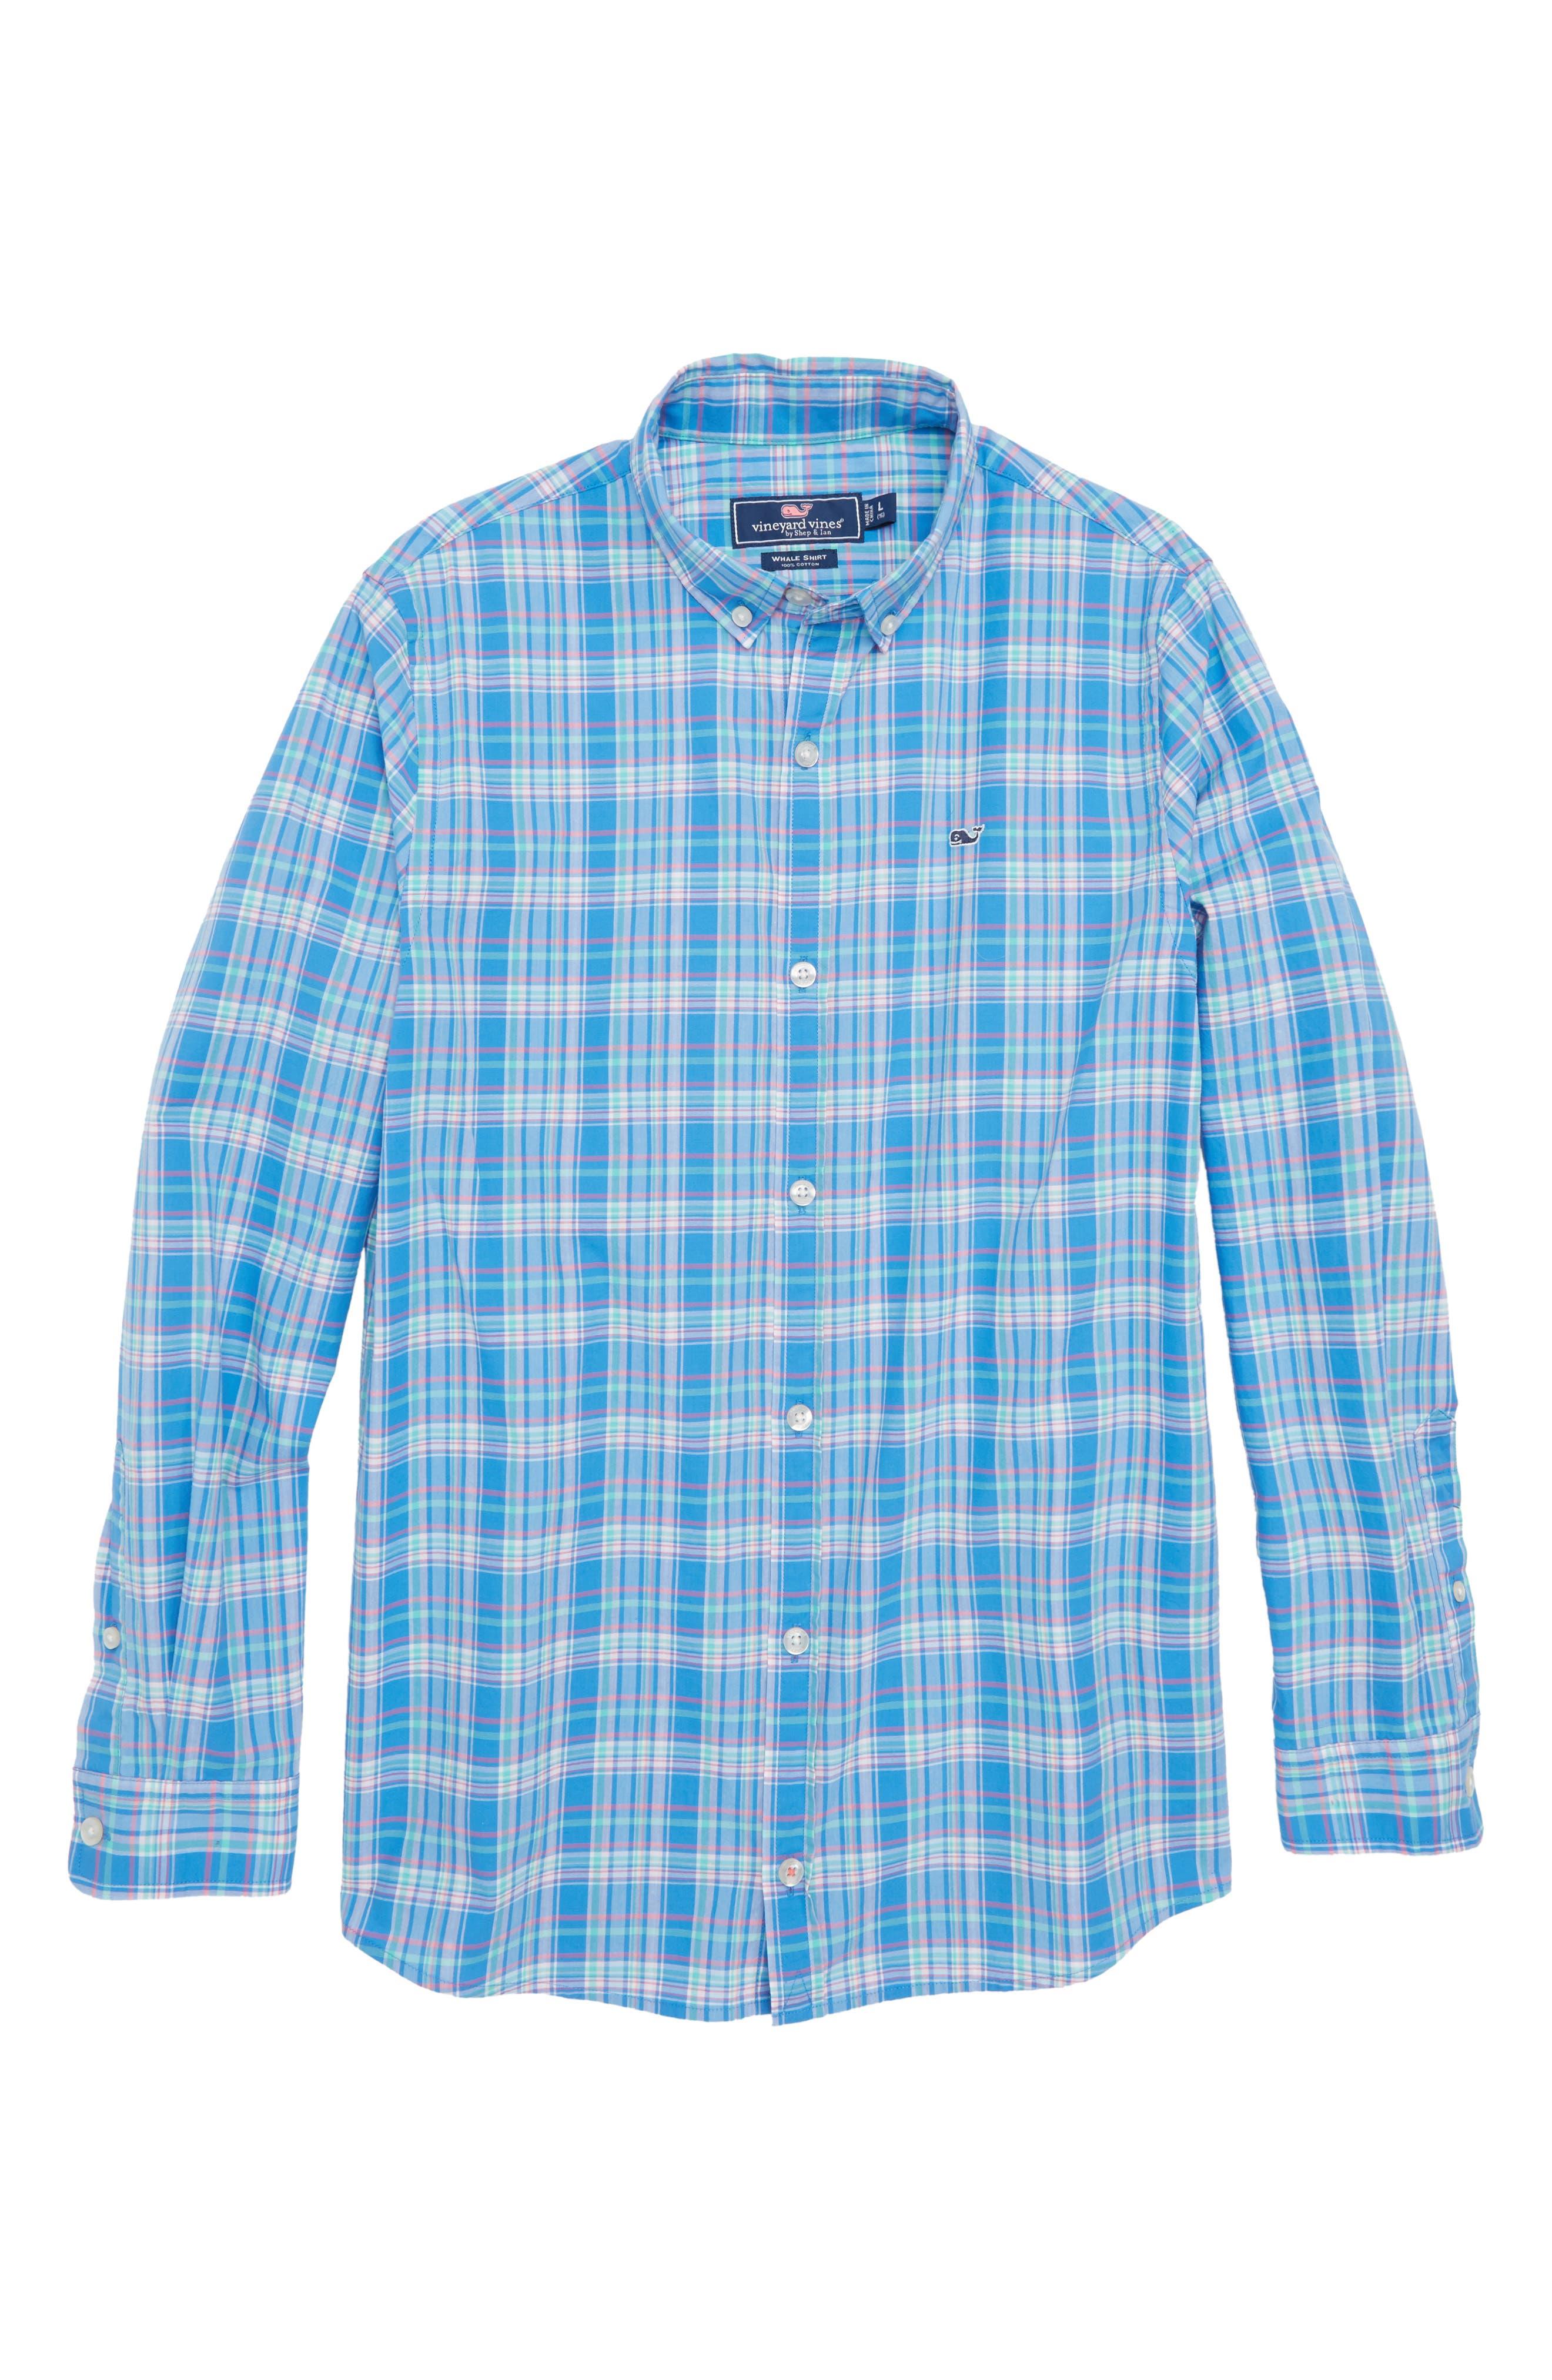 Bita Bay Plaid Woven Shirt,                         Main,                         color, 400